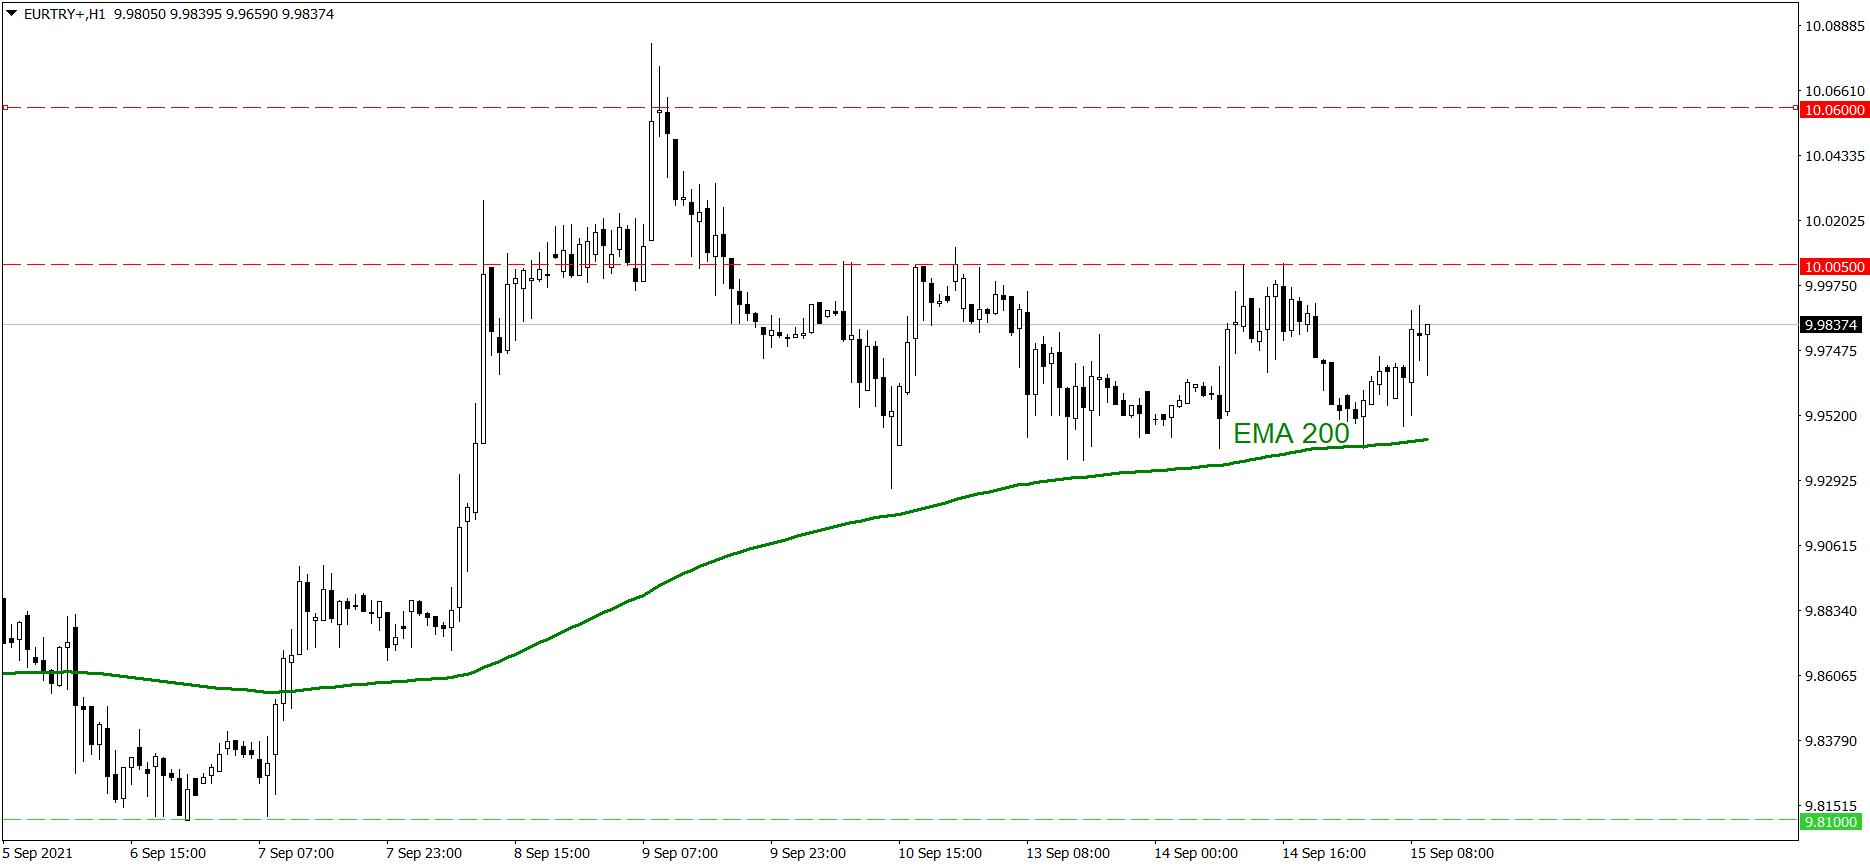 Analiza pary walutowej EURTRY